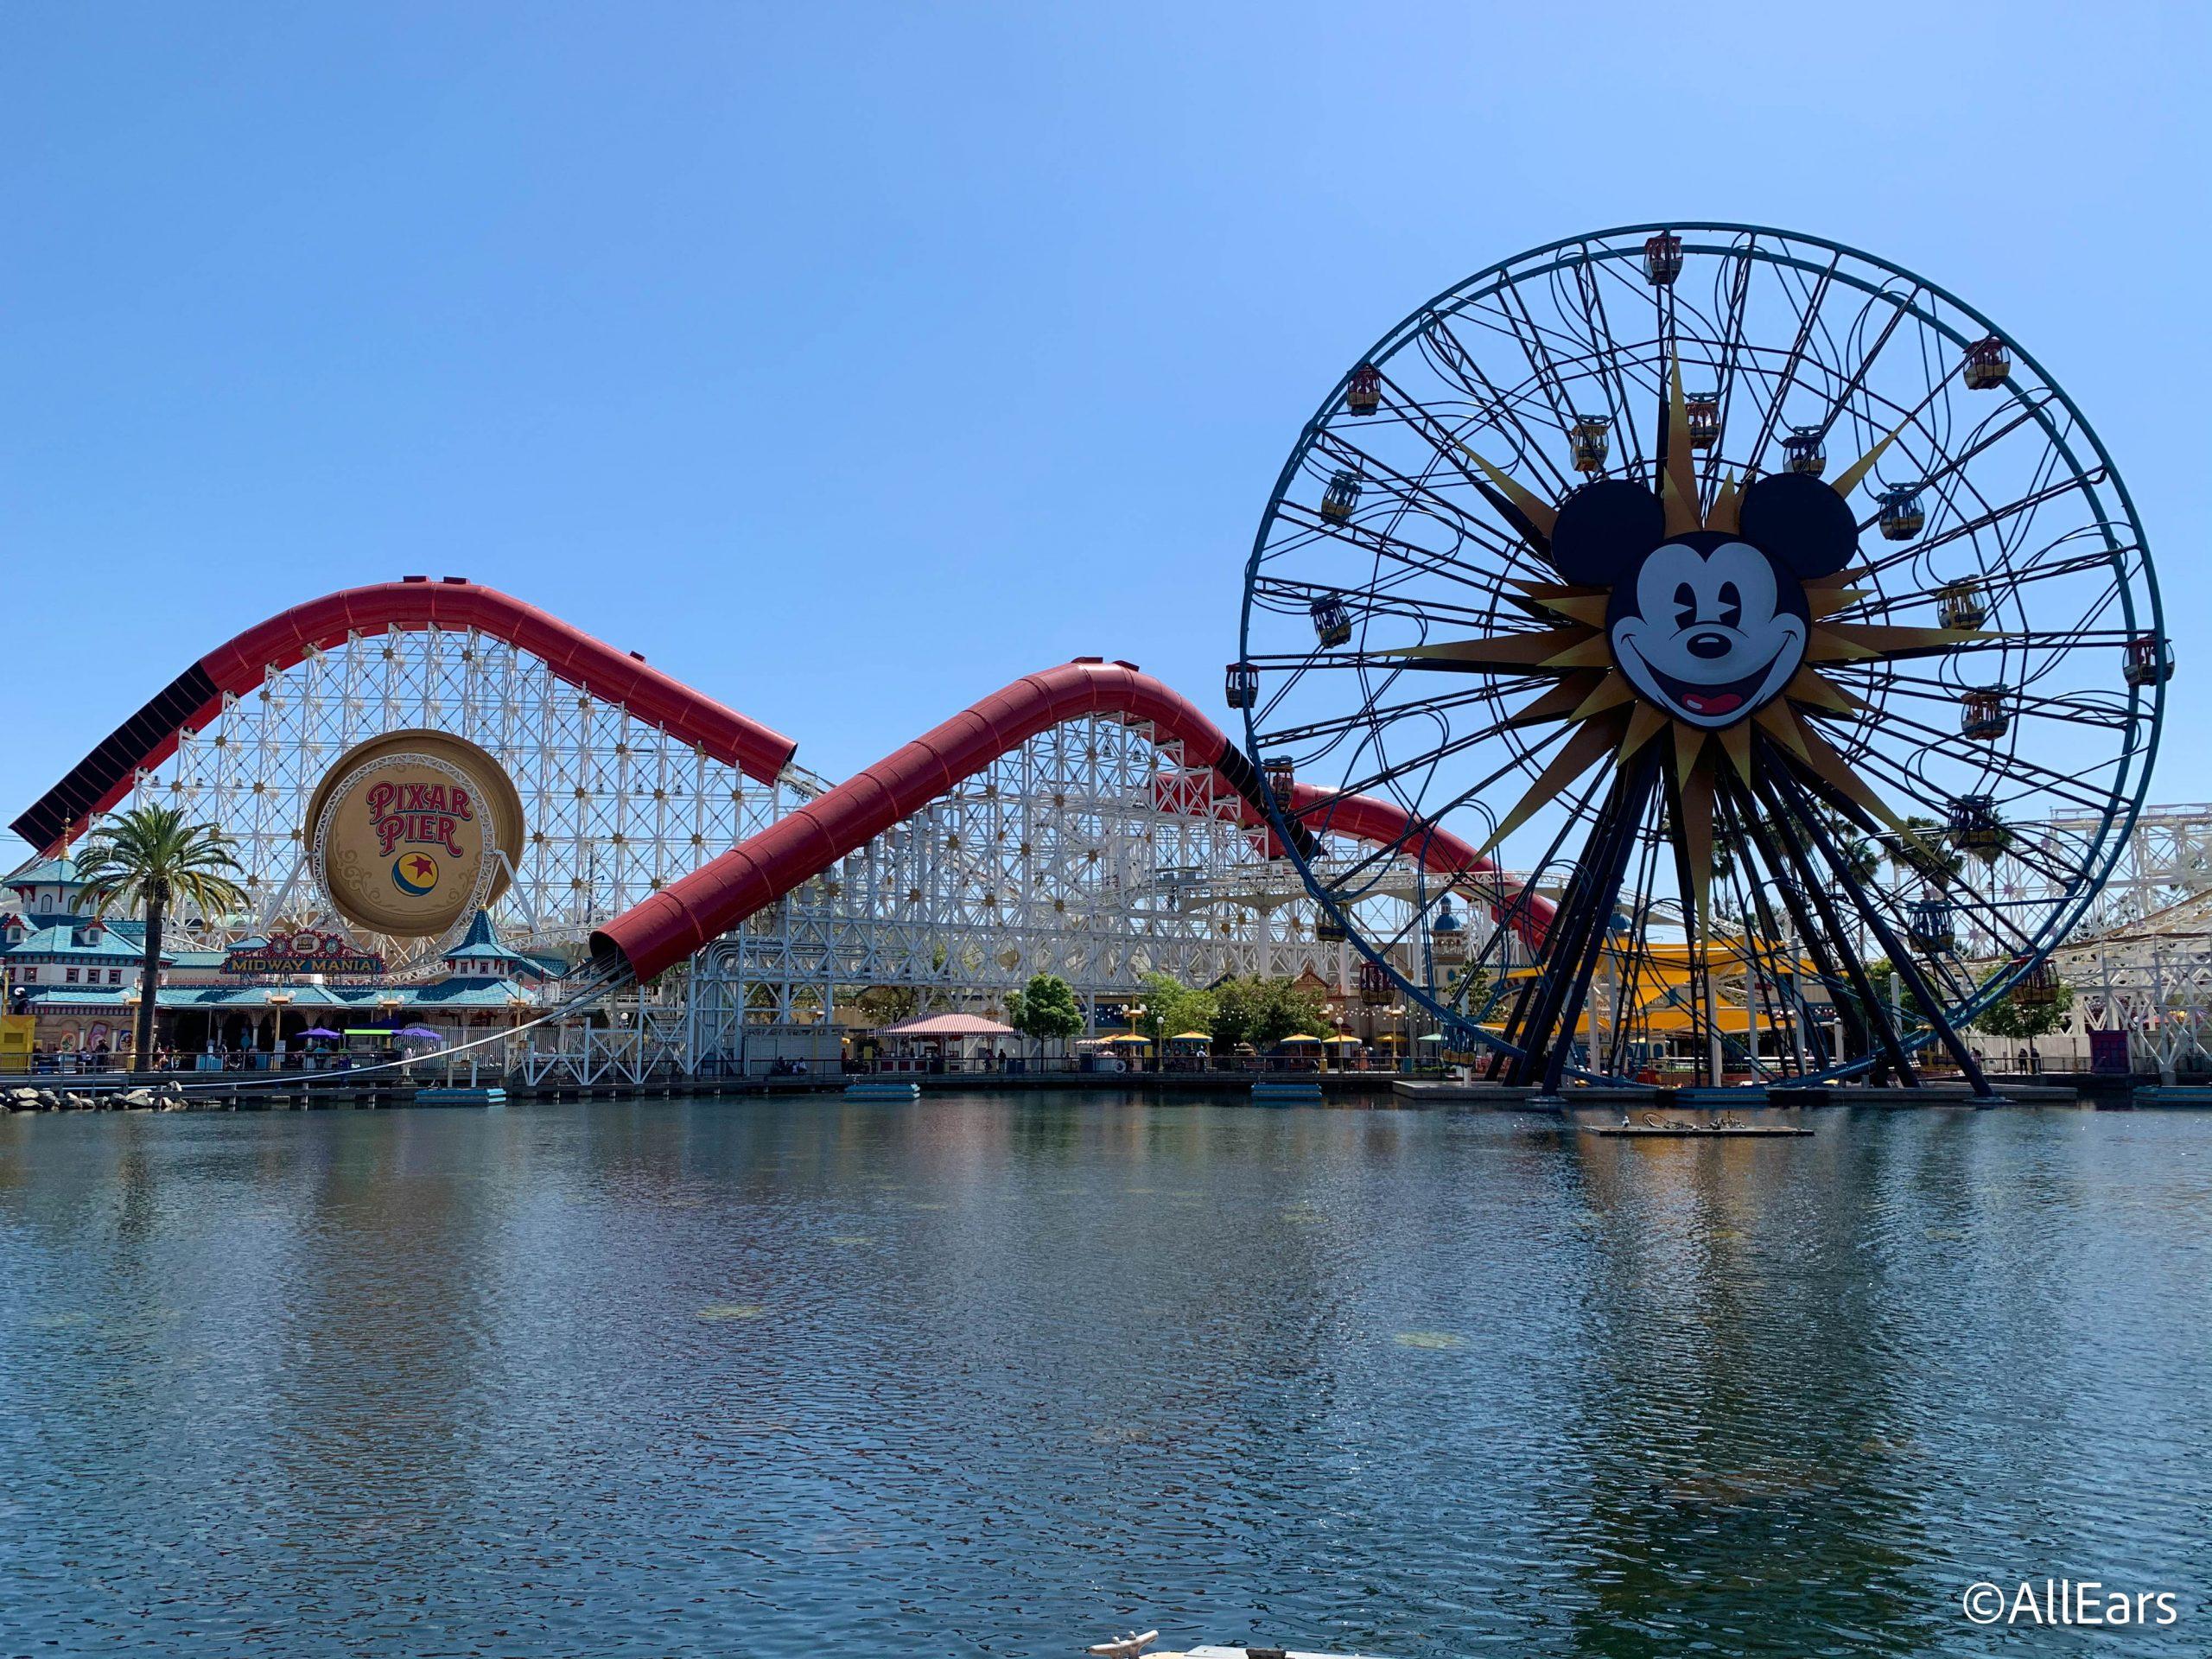 allears.net - Rachel Franko - Menu Released for Disneyland Resort's Alfresco Tasting Terrace!